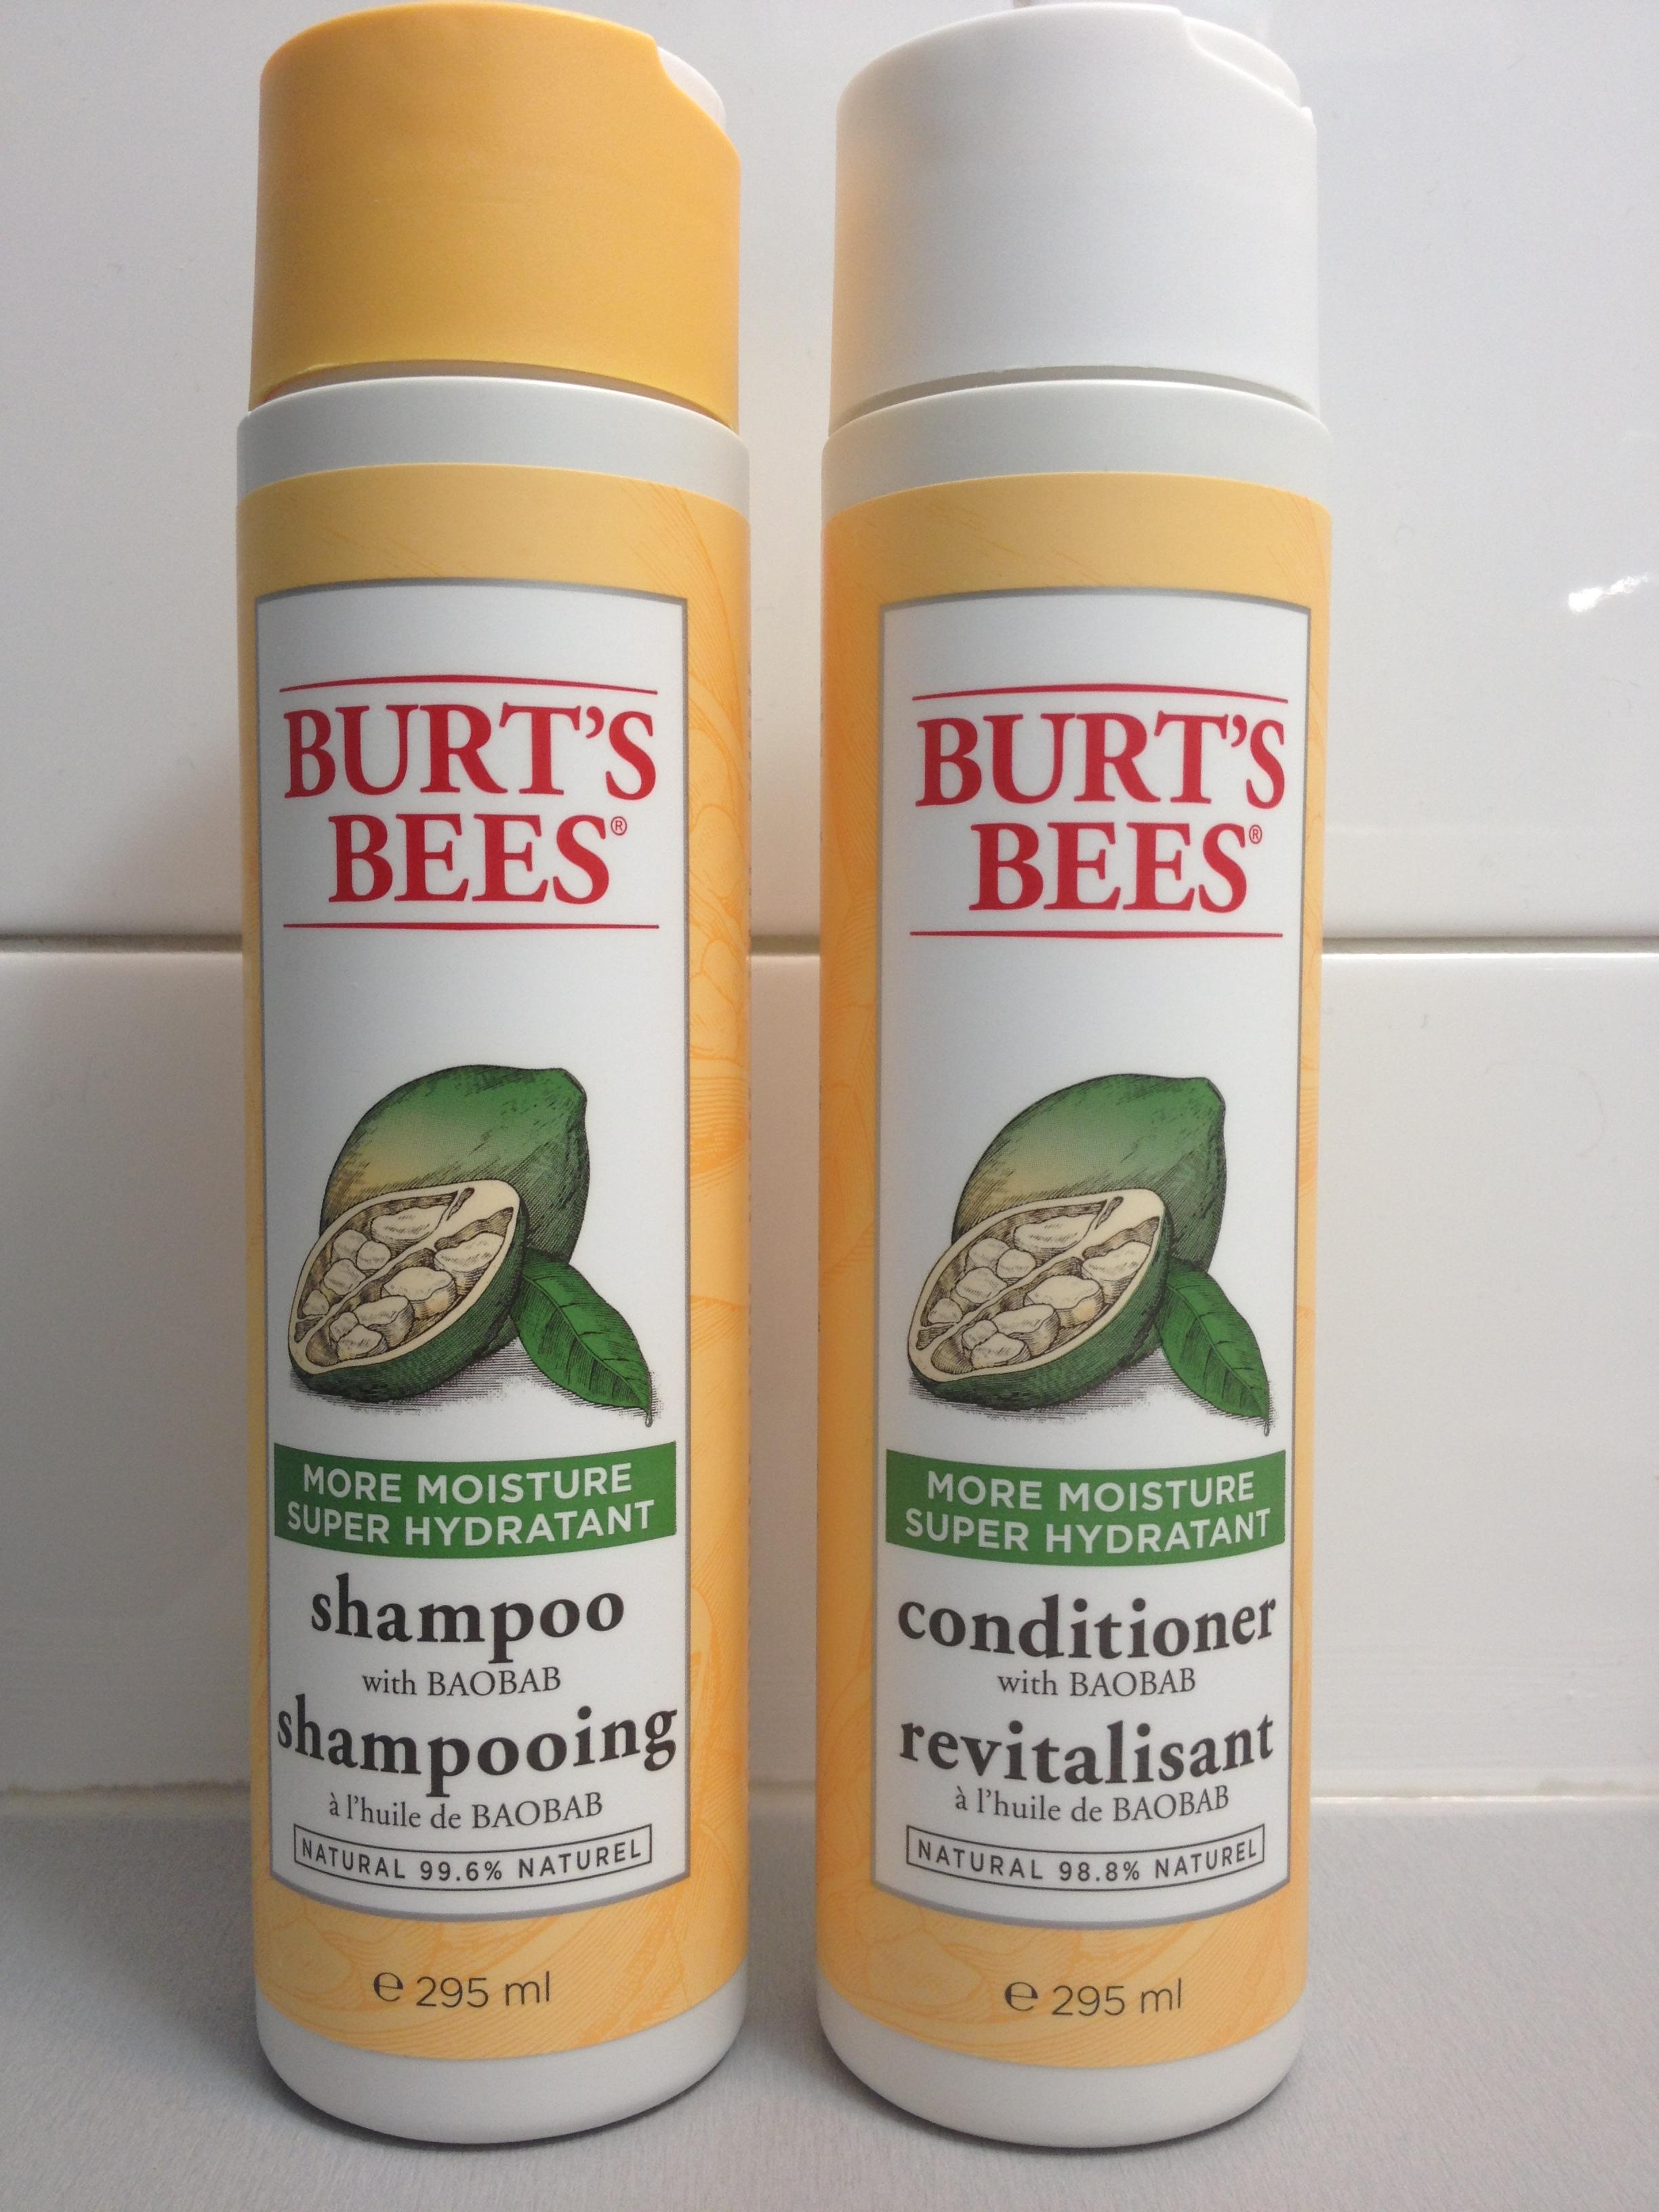 burts bees conditioner